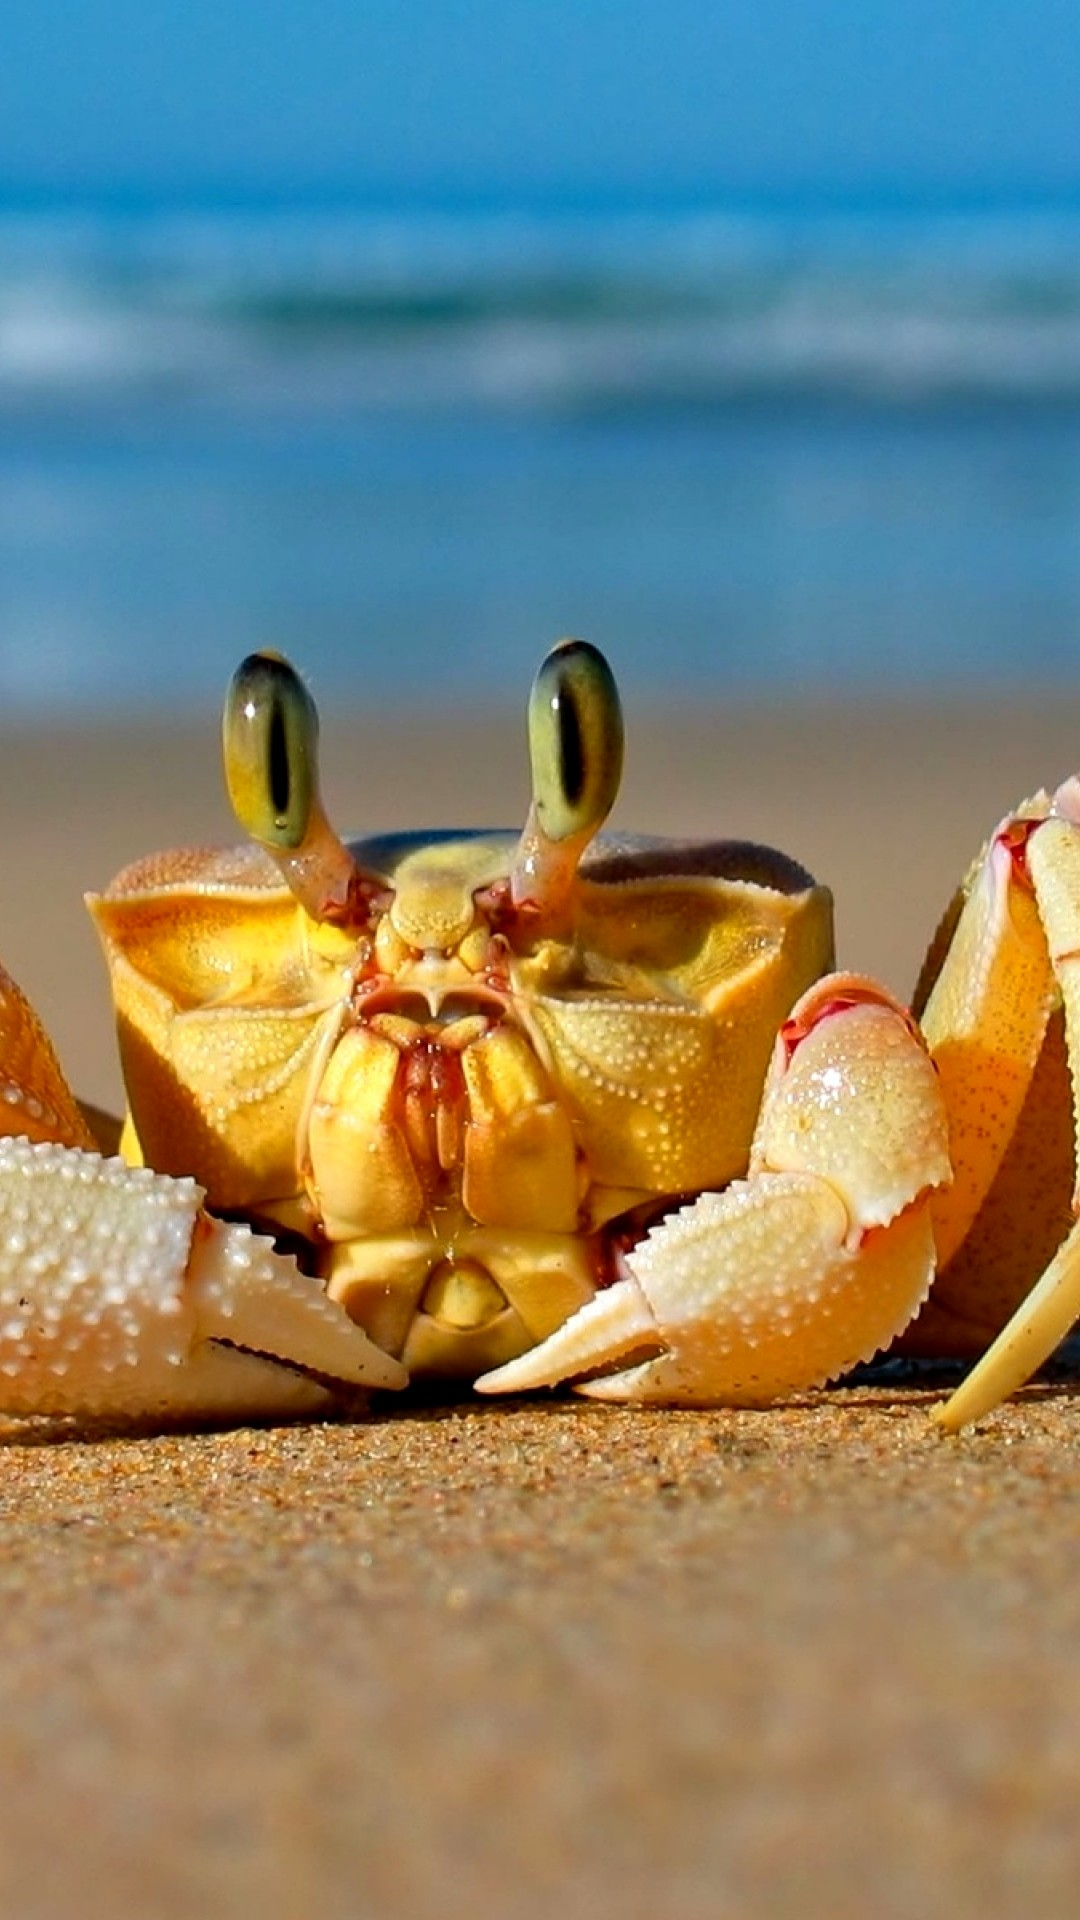 wallpaper crab  mediterranean sea  sand  funny  cute